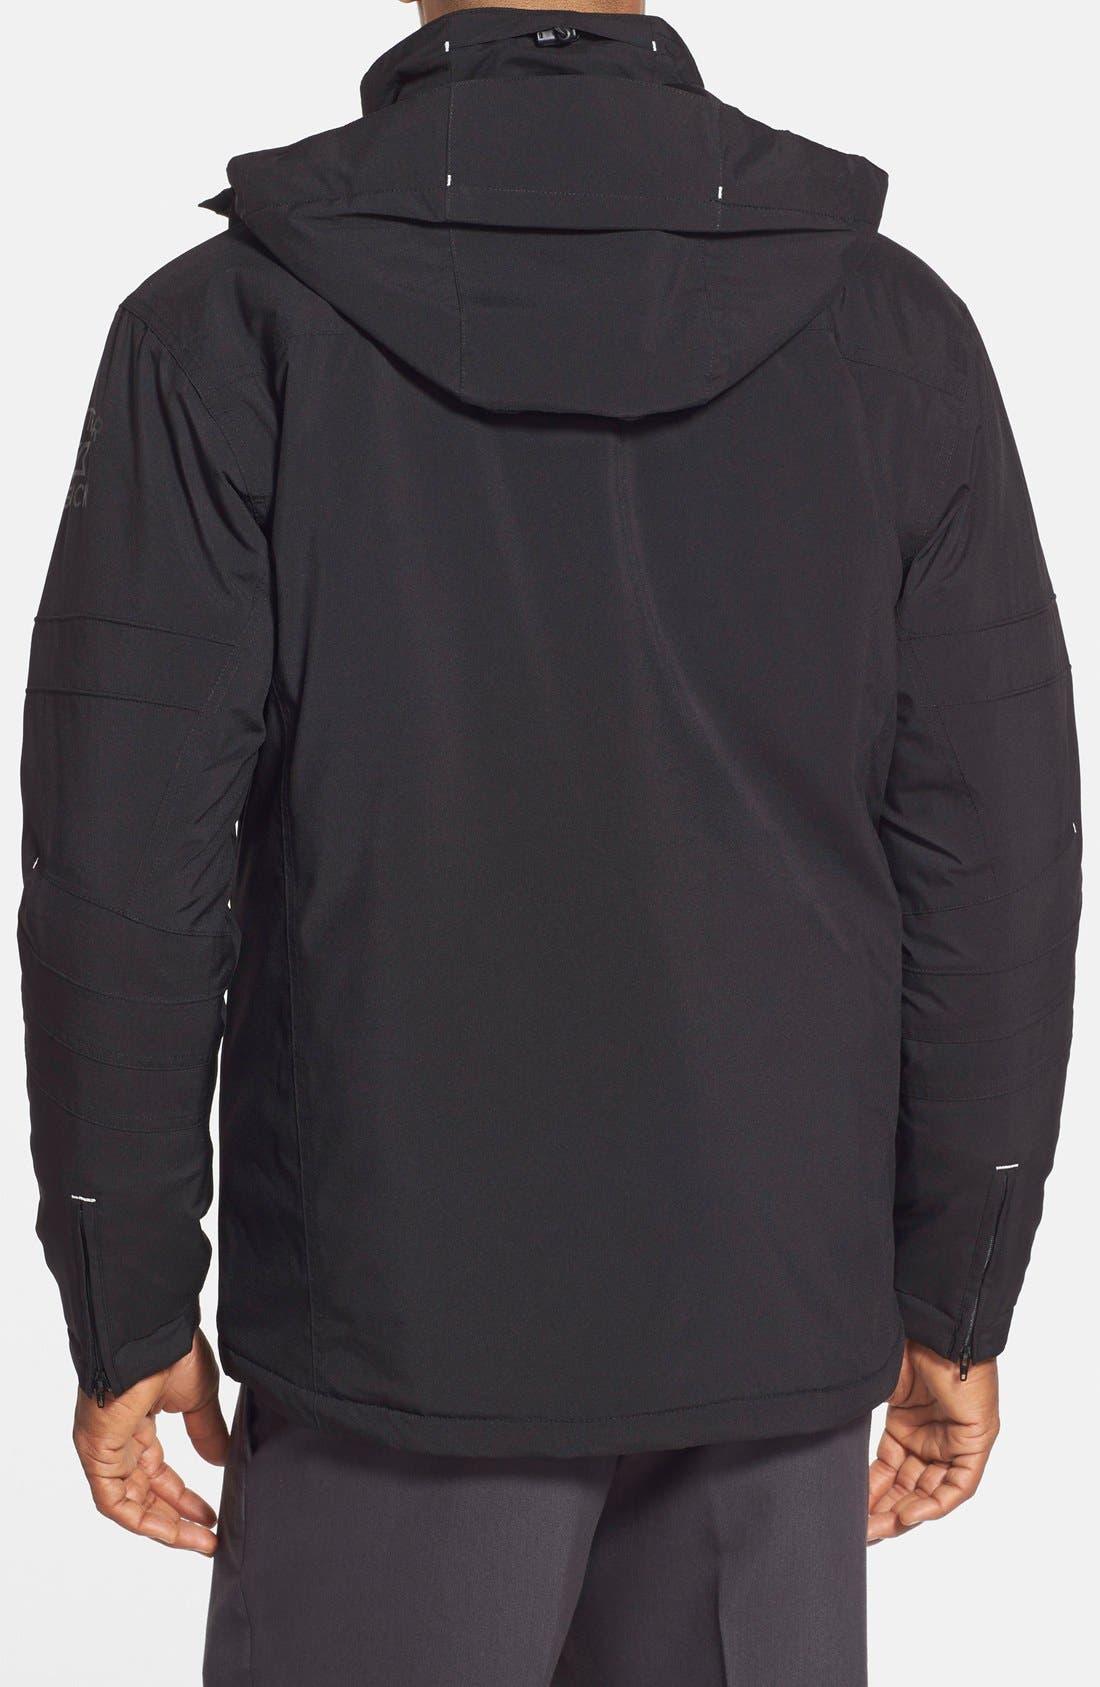 Alternate Image 2  - Cutter & Buck 'WeatherTec Sanders' Jacket (Online Only)